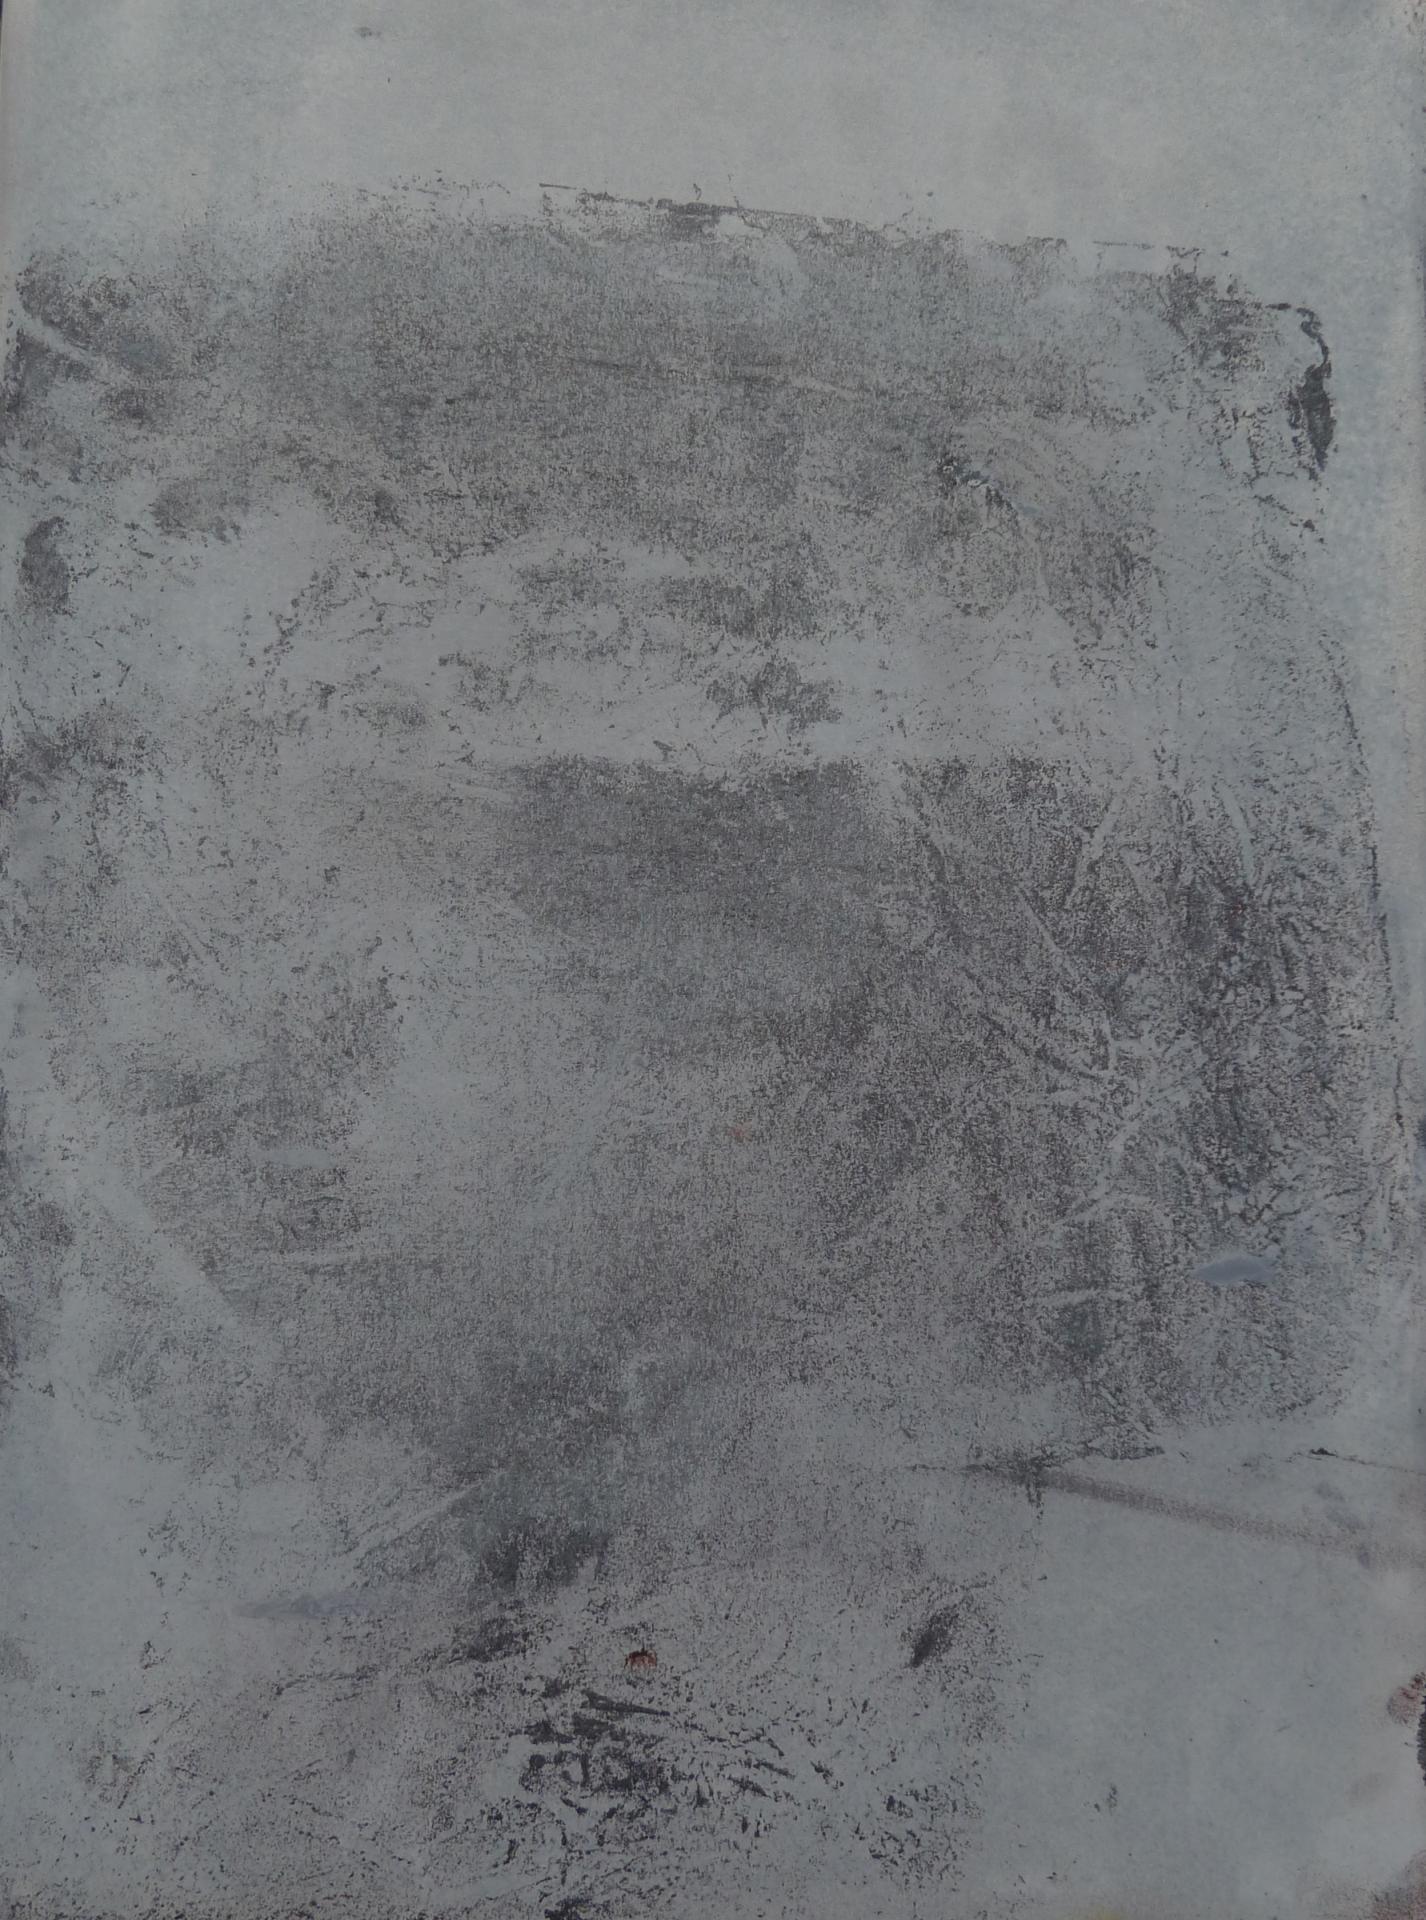 Janv 14 72